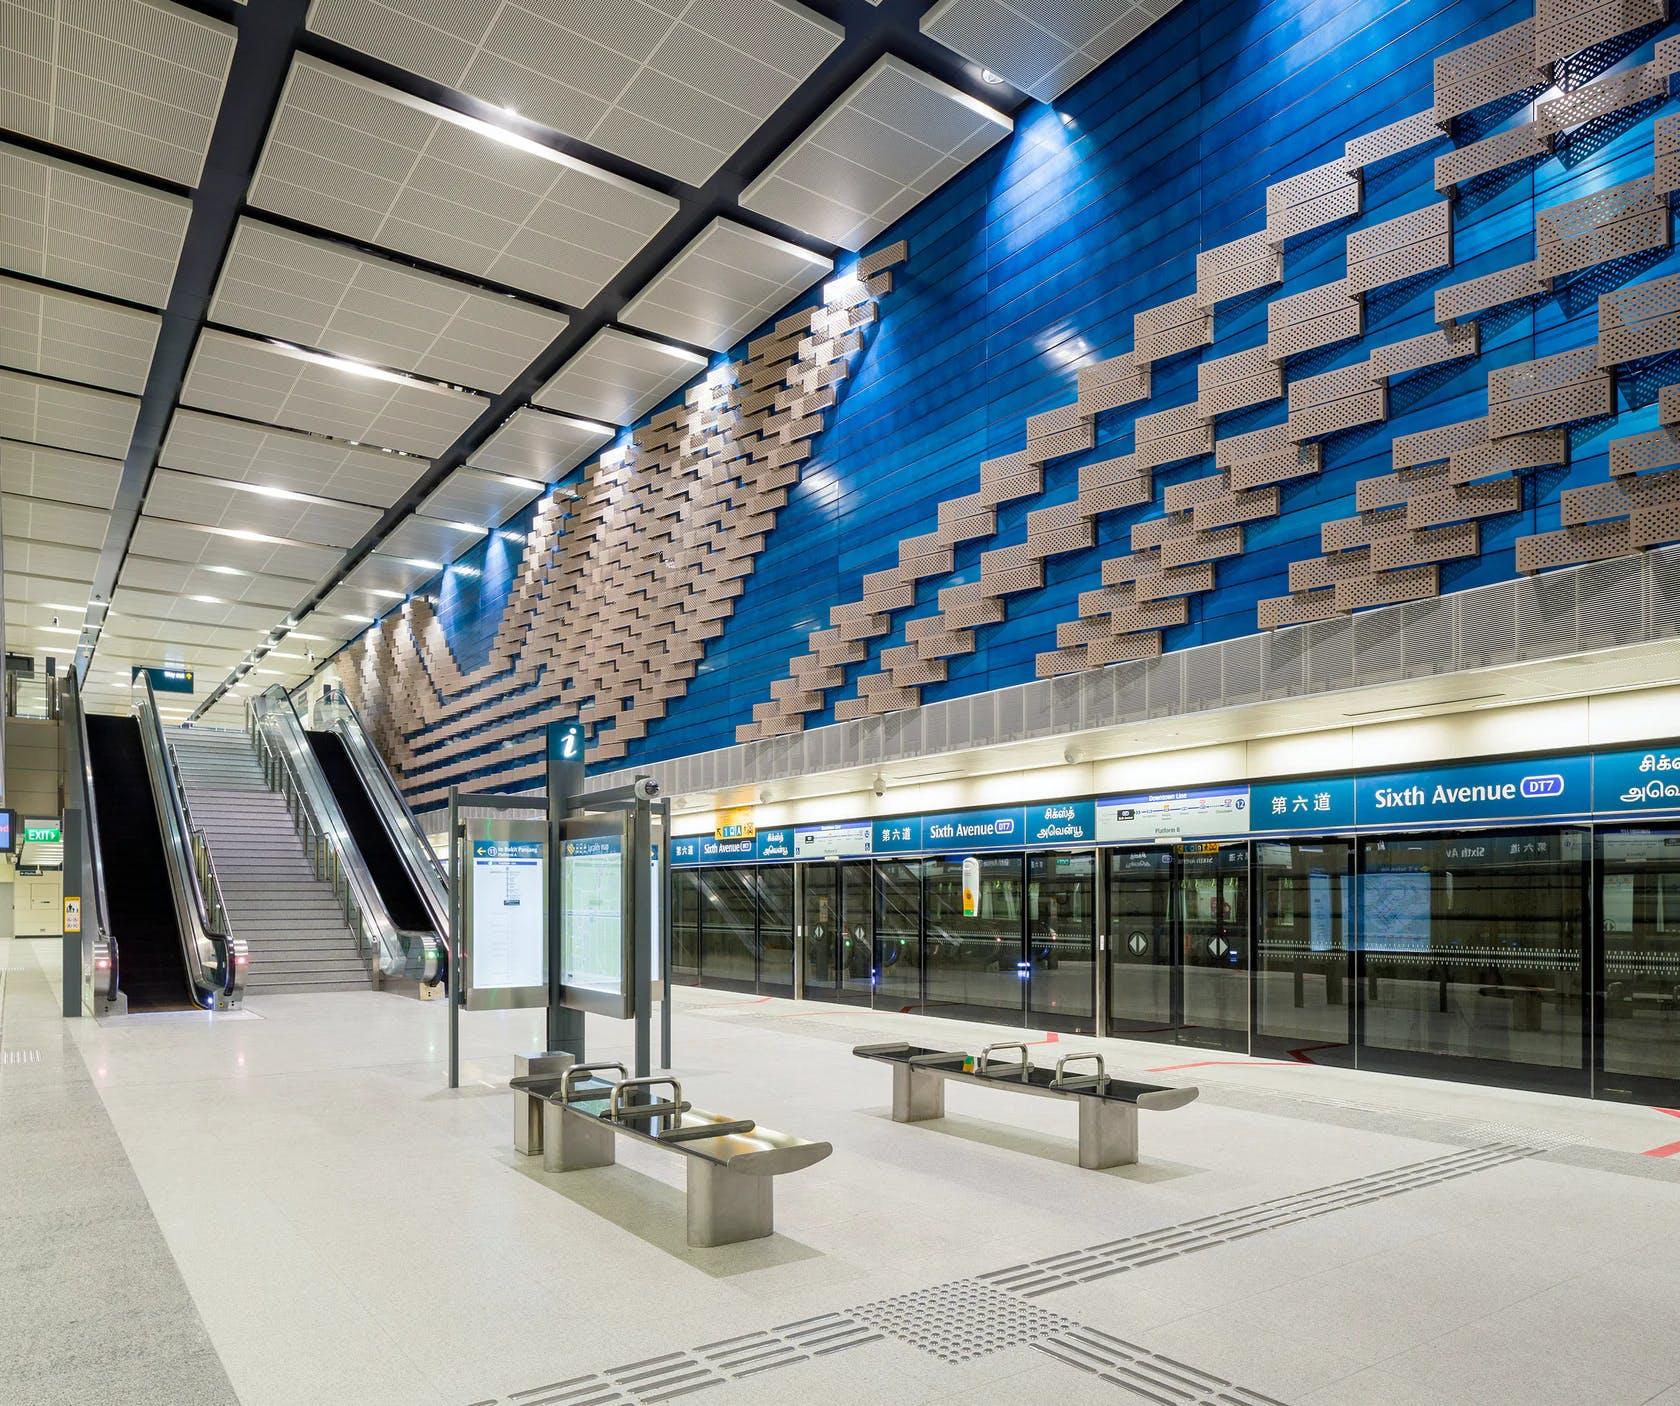 Sixth Avenue MRT Station - runs along the Downtown Line